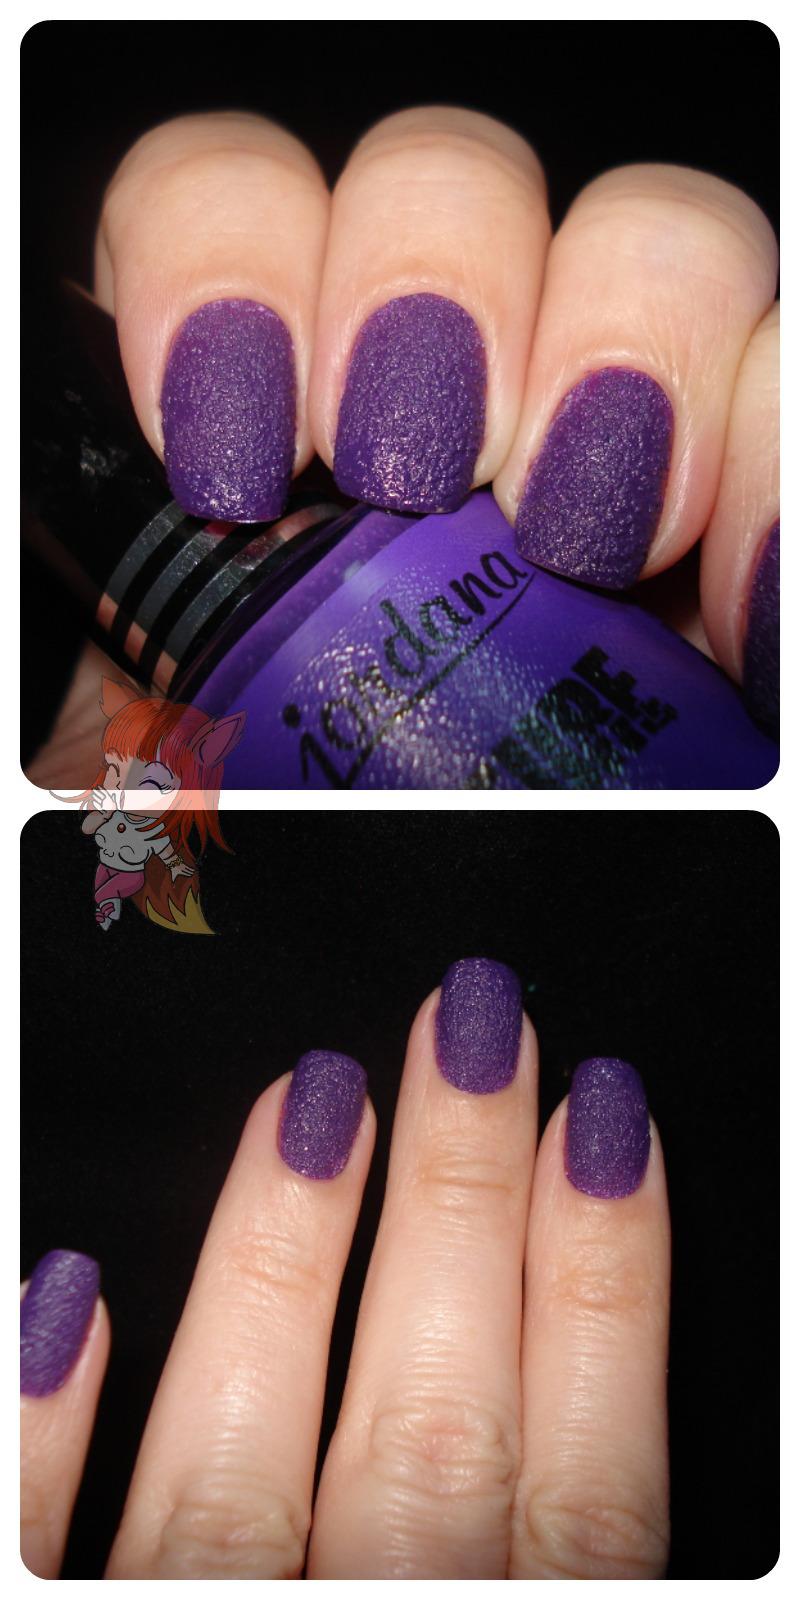 Esmalte Jordana Texture :: Raging Purple - Resenha